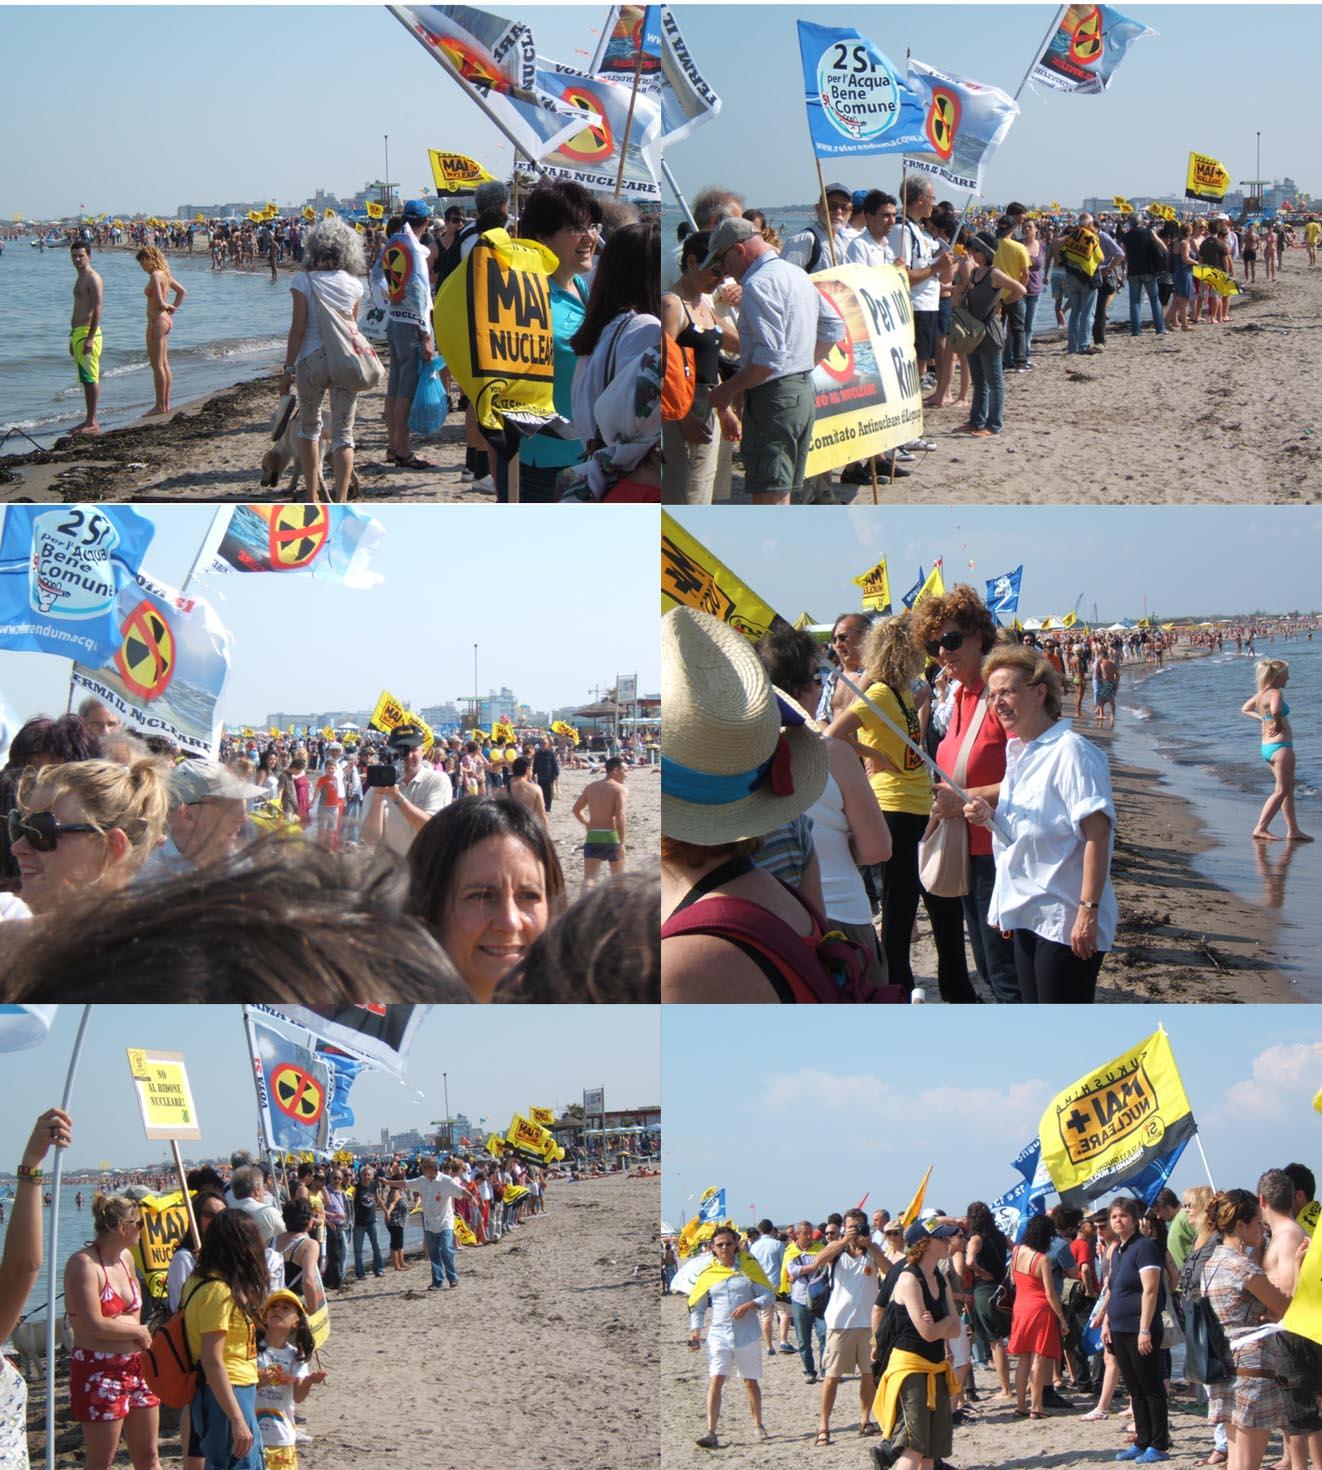 Referendum: catene umane nel weekend, a Montecitorio il presidio permanente